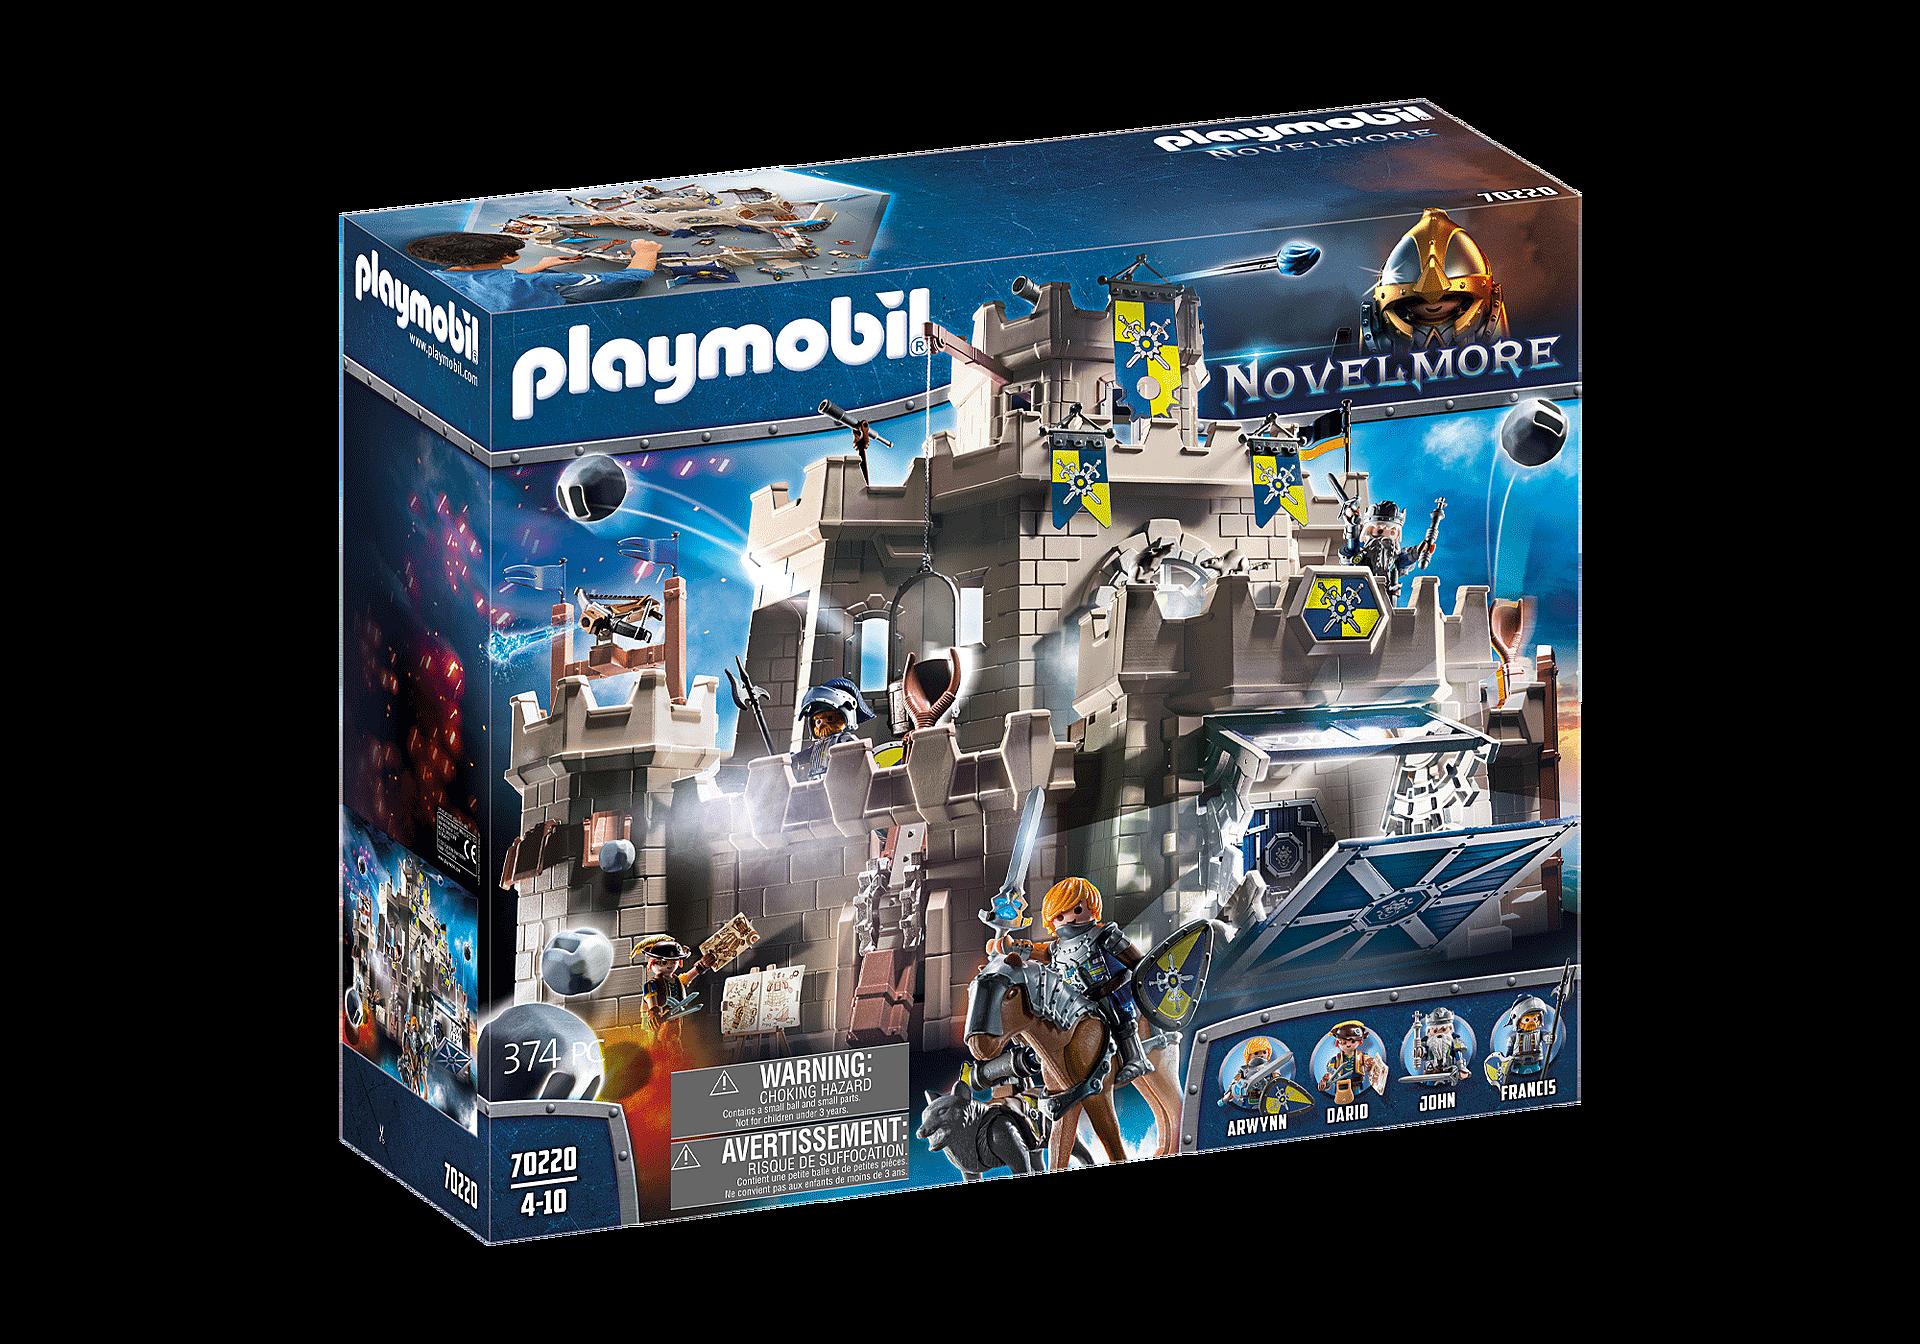 http://media.playmobil.com/i/playmobil/70220_product_box_front/Große Burg von Novelmore